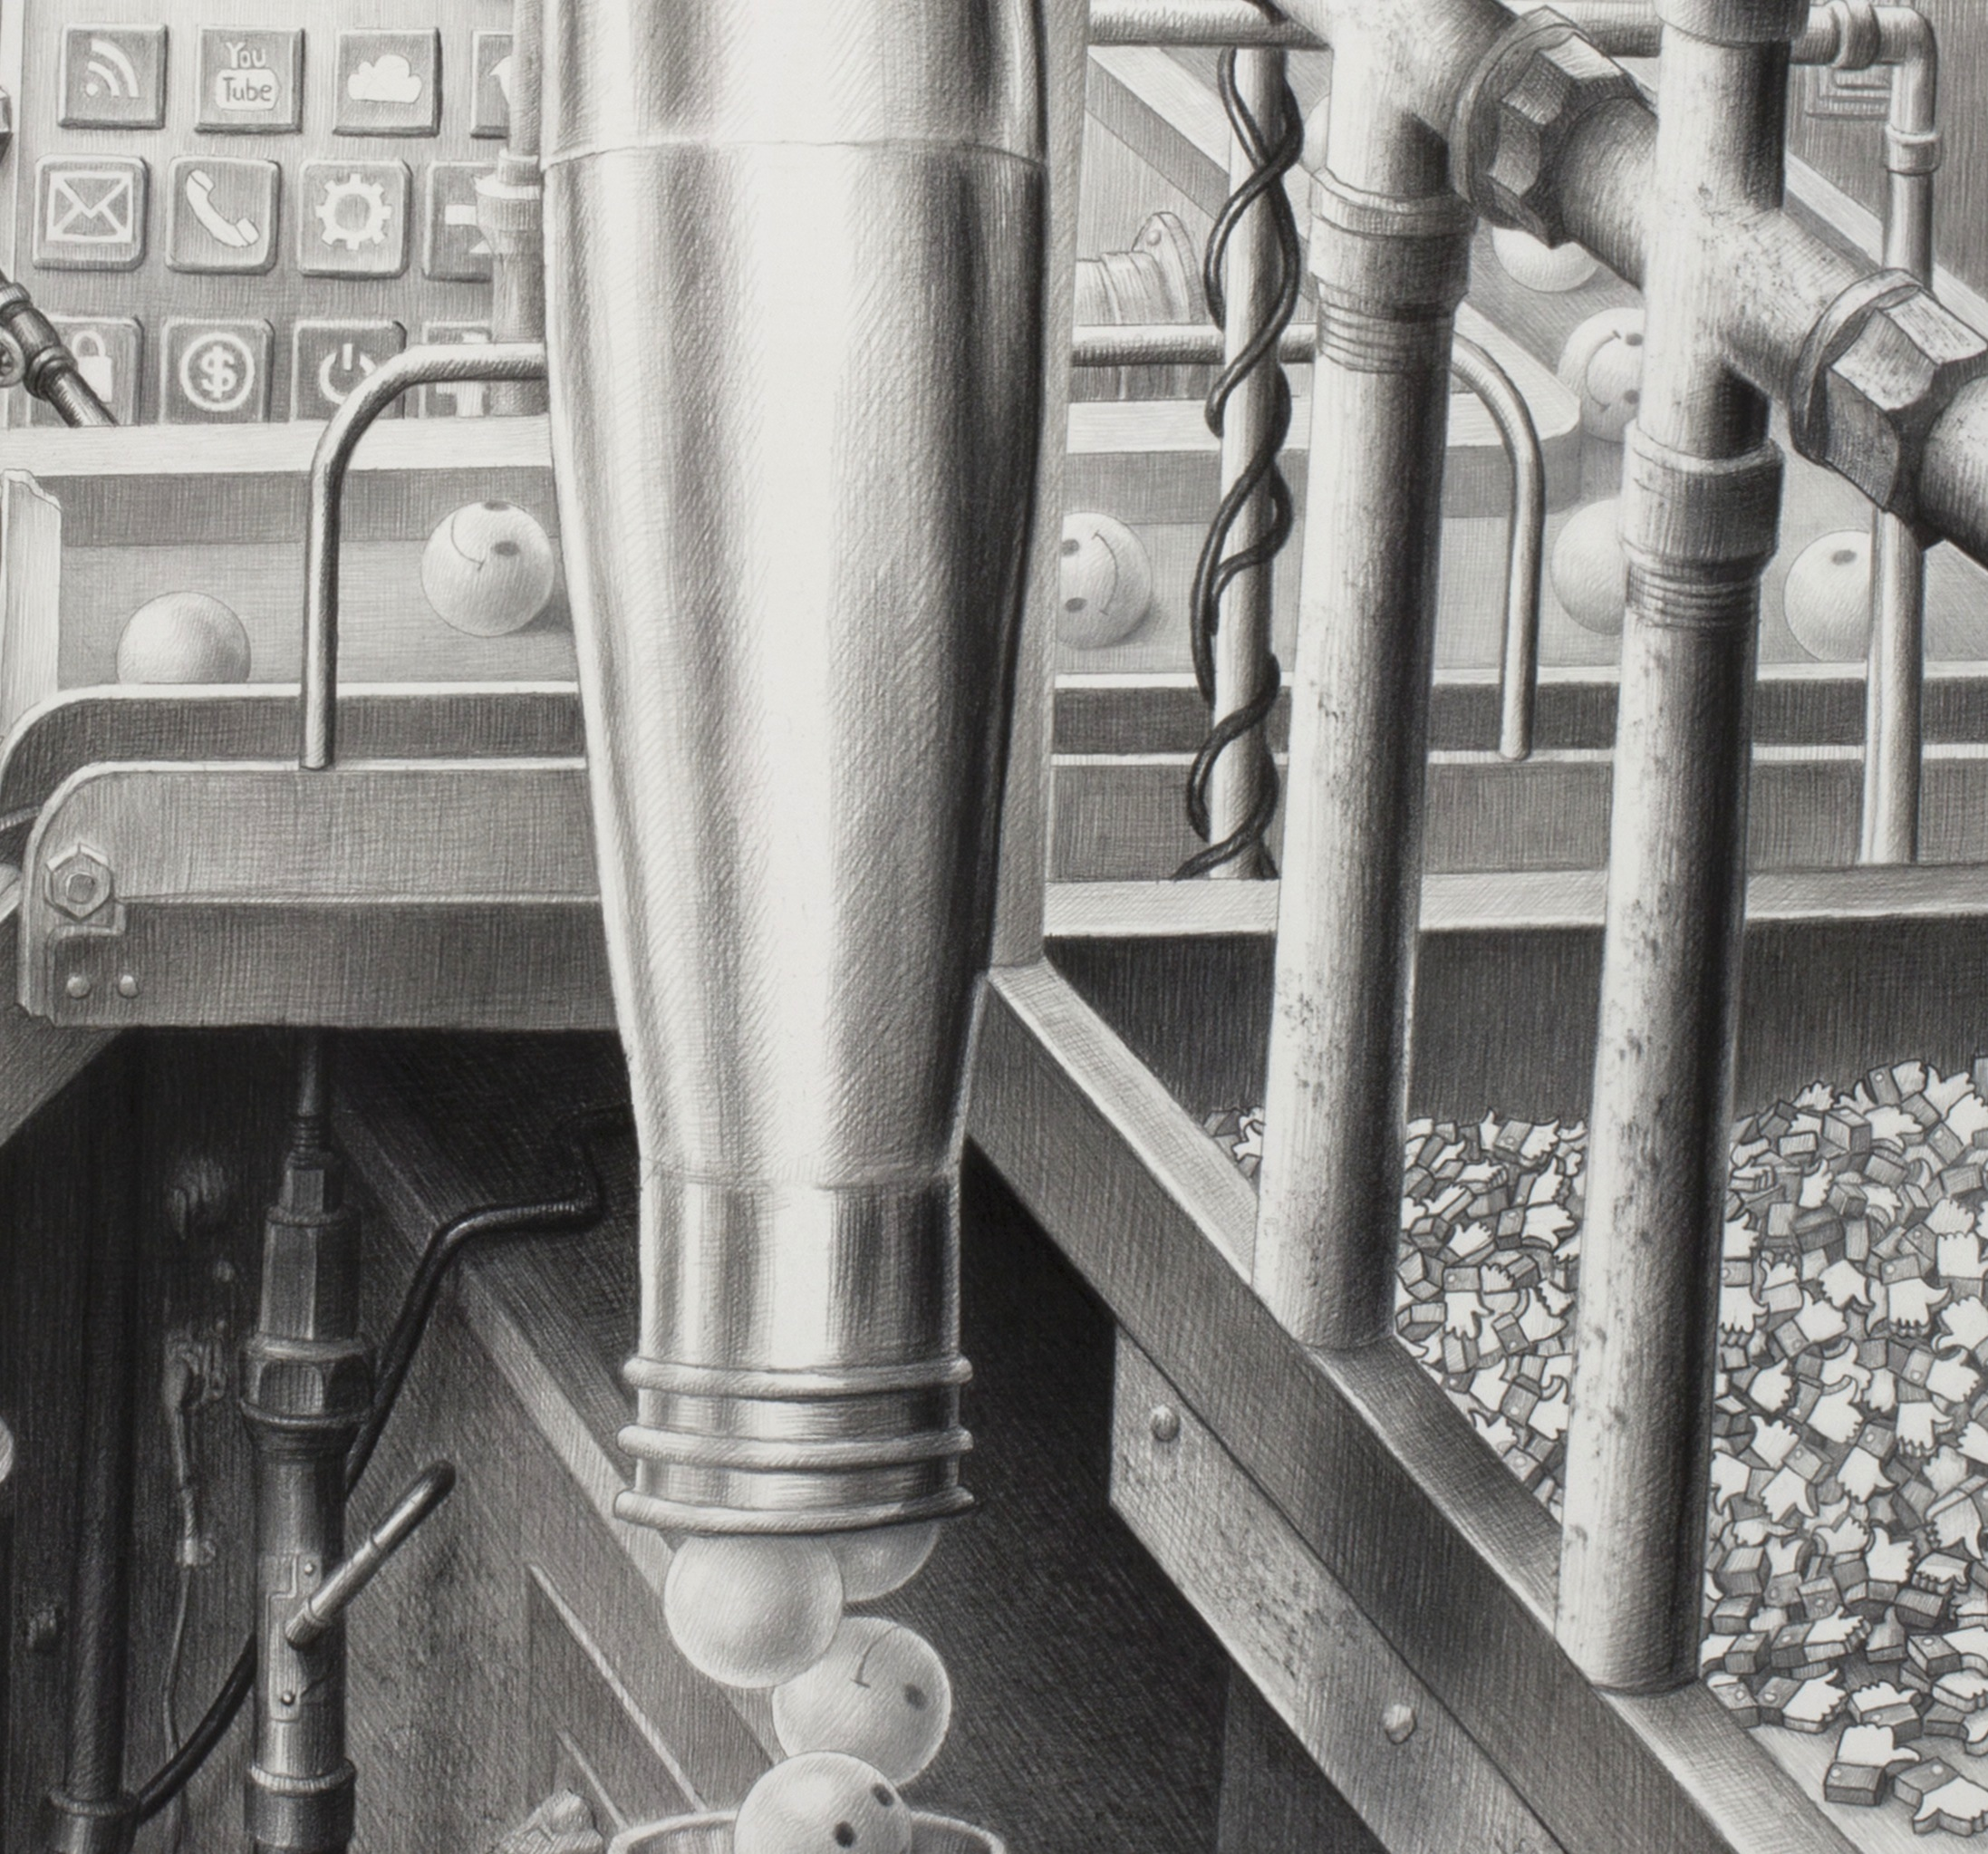 Trump, resist, media, post truth detail, Laurie Lipton drawing